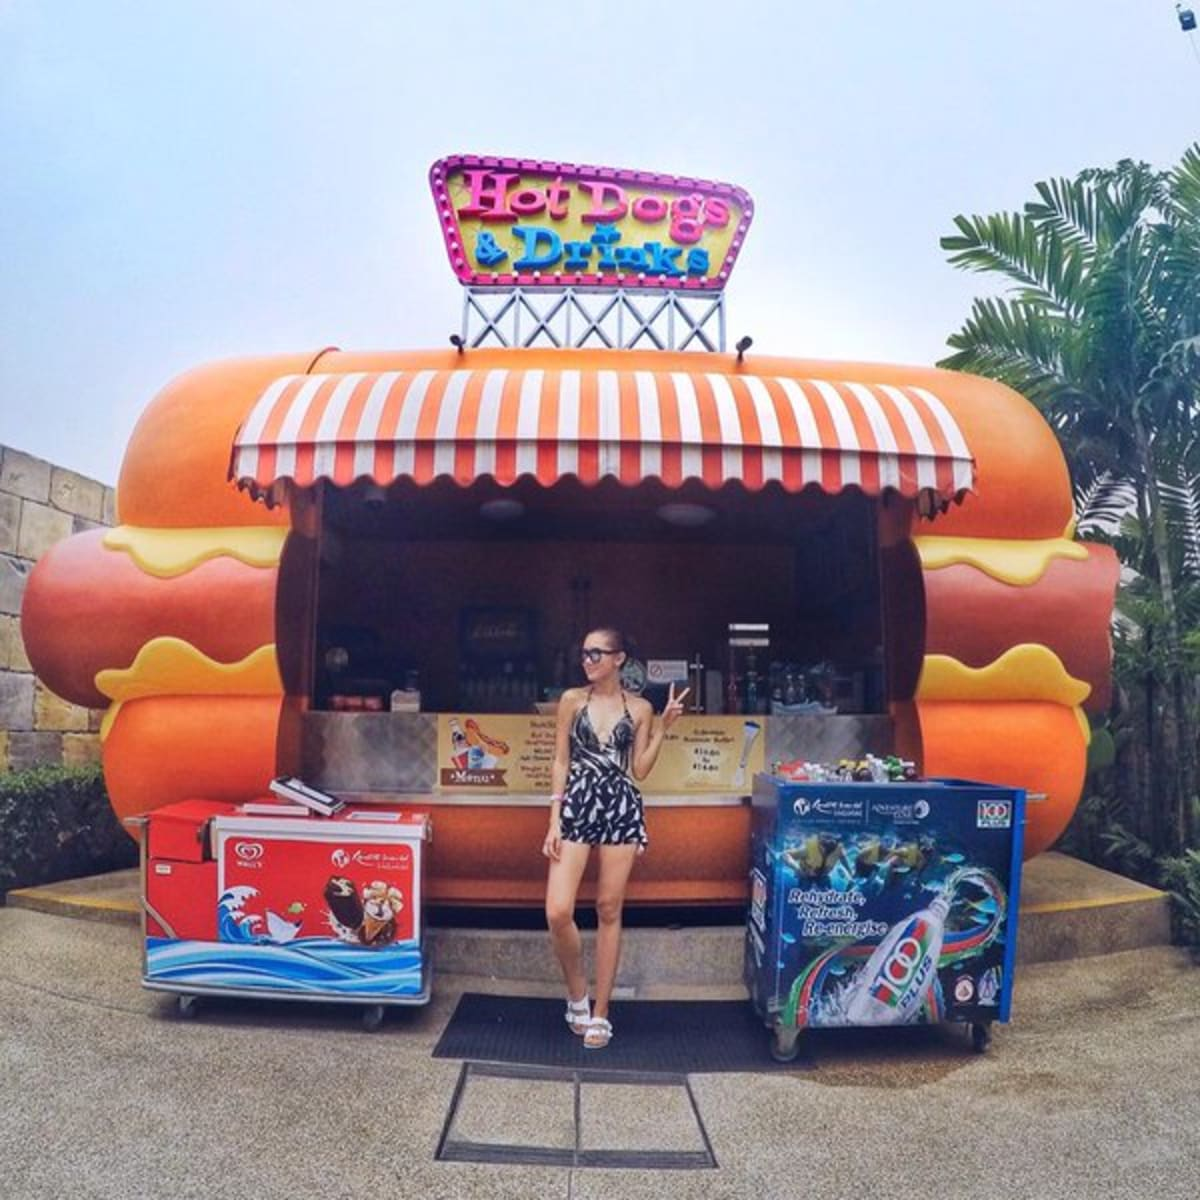 Hotdogs & drinks